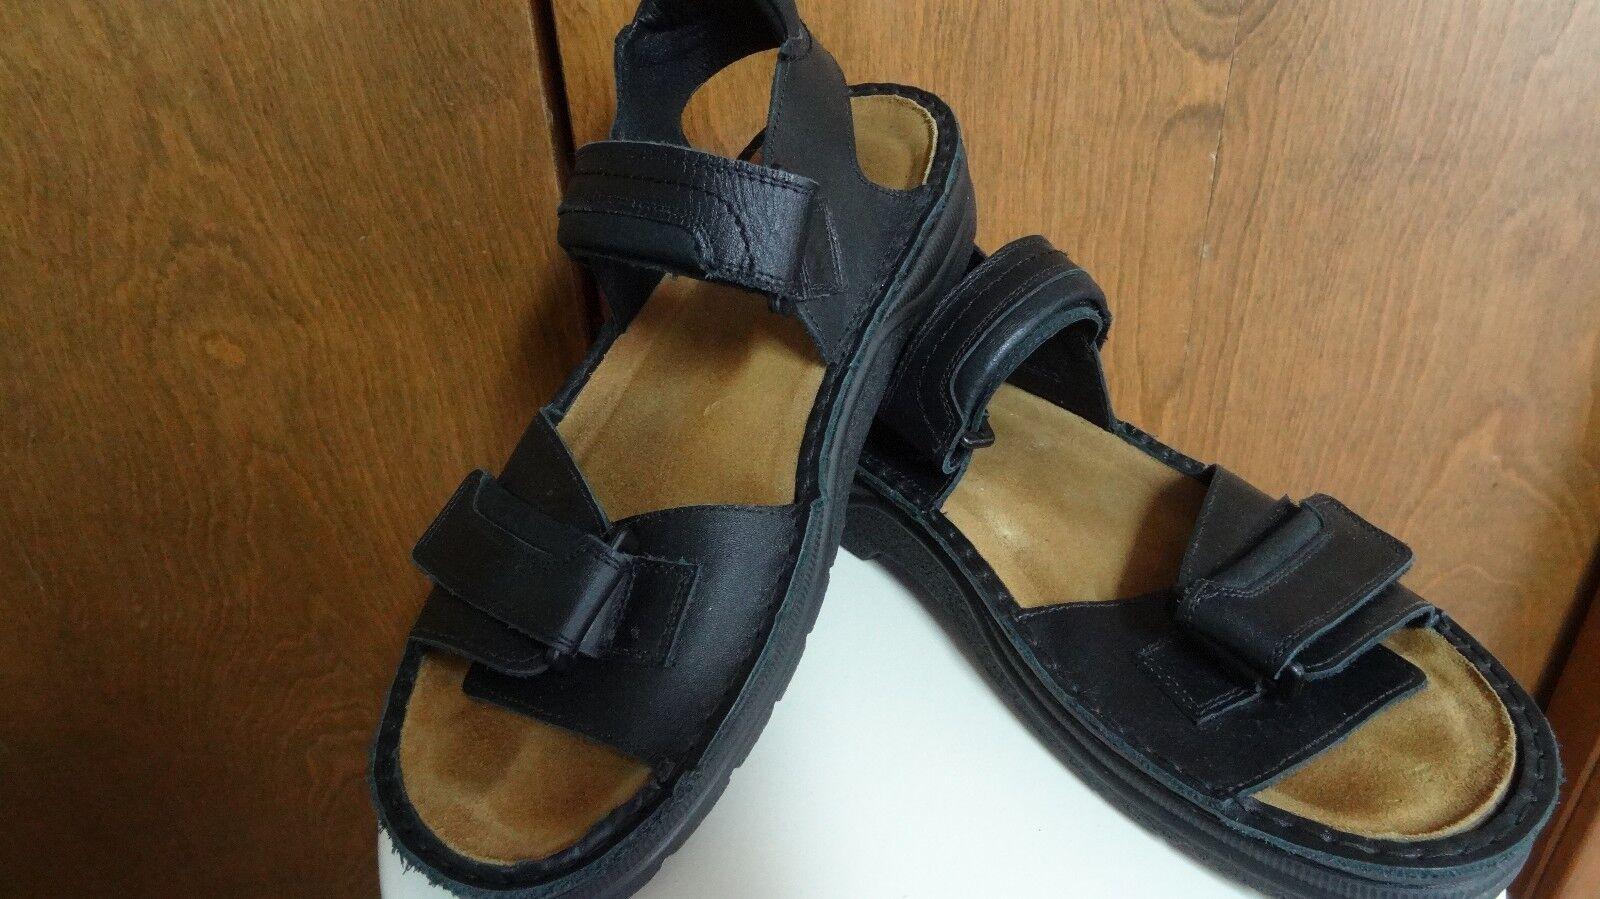 Naot Leather Sandal's, 44 EU